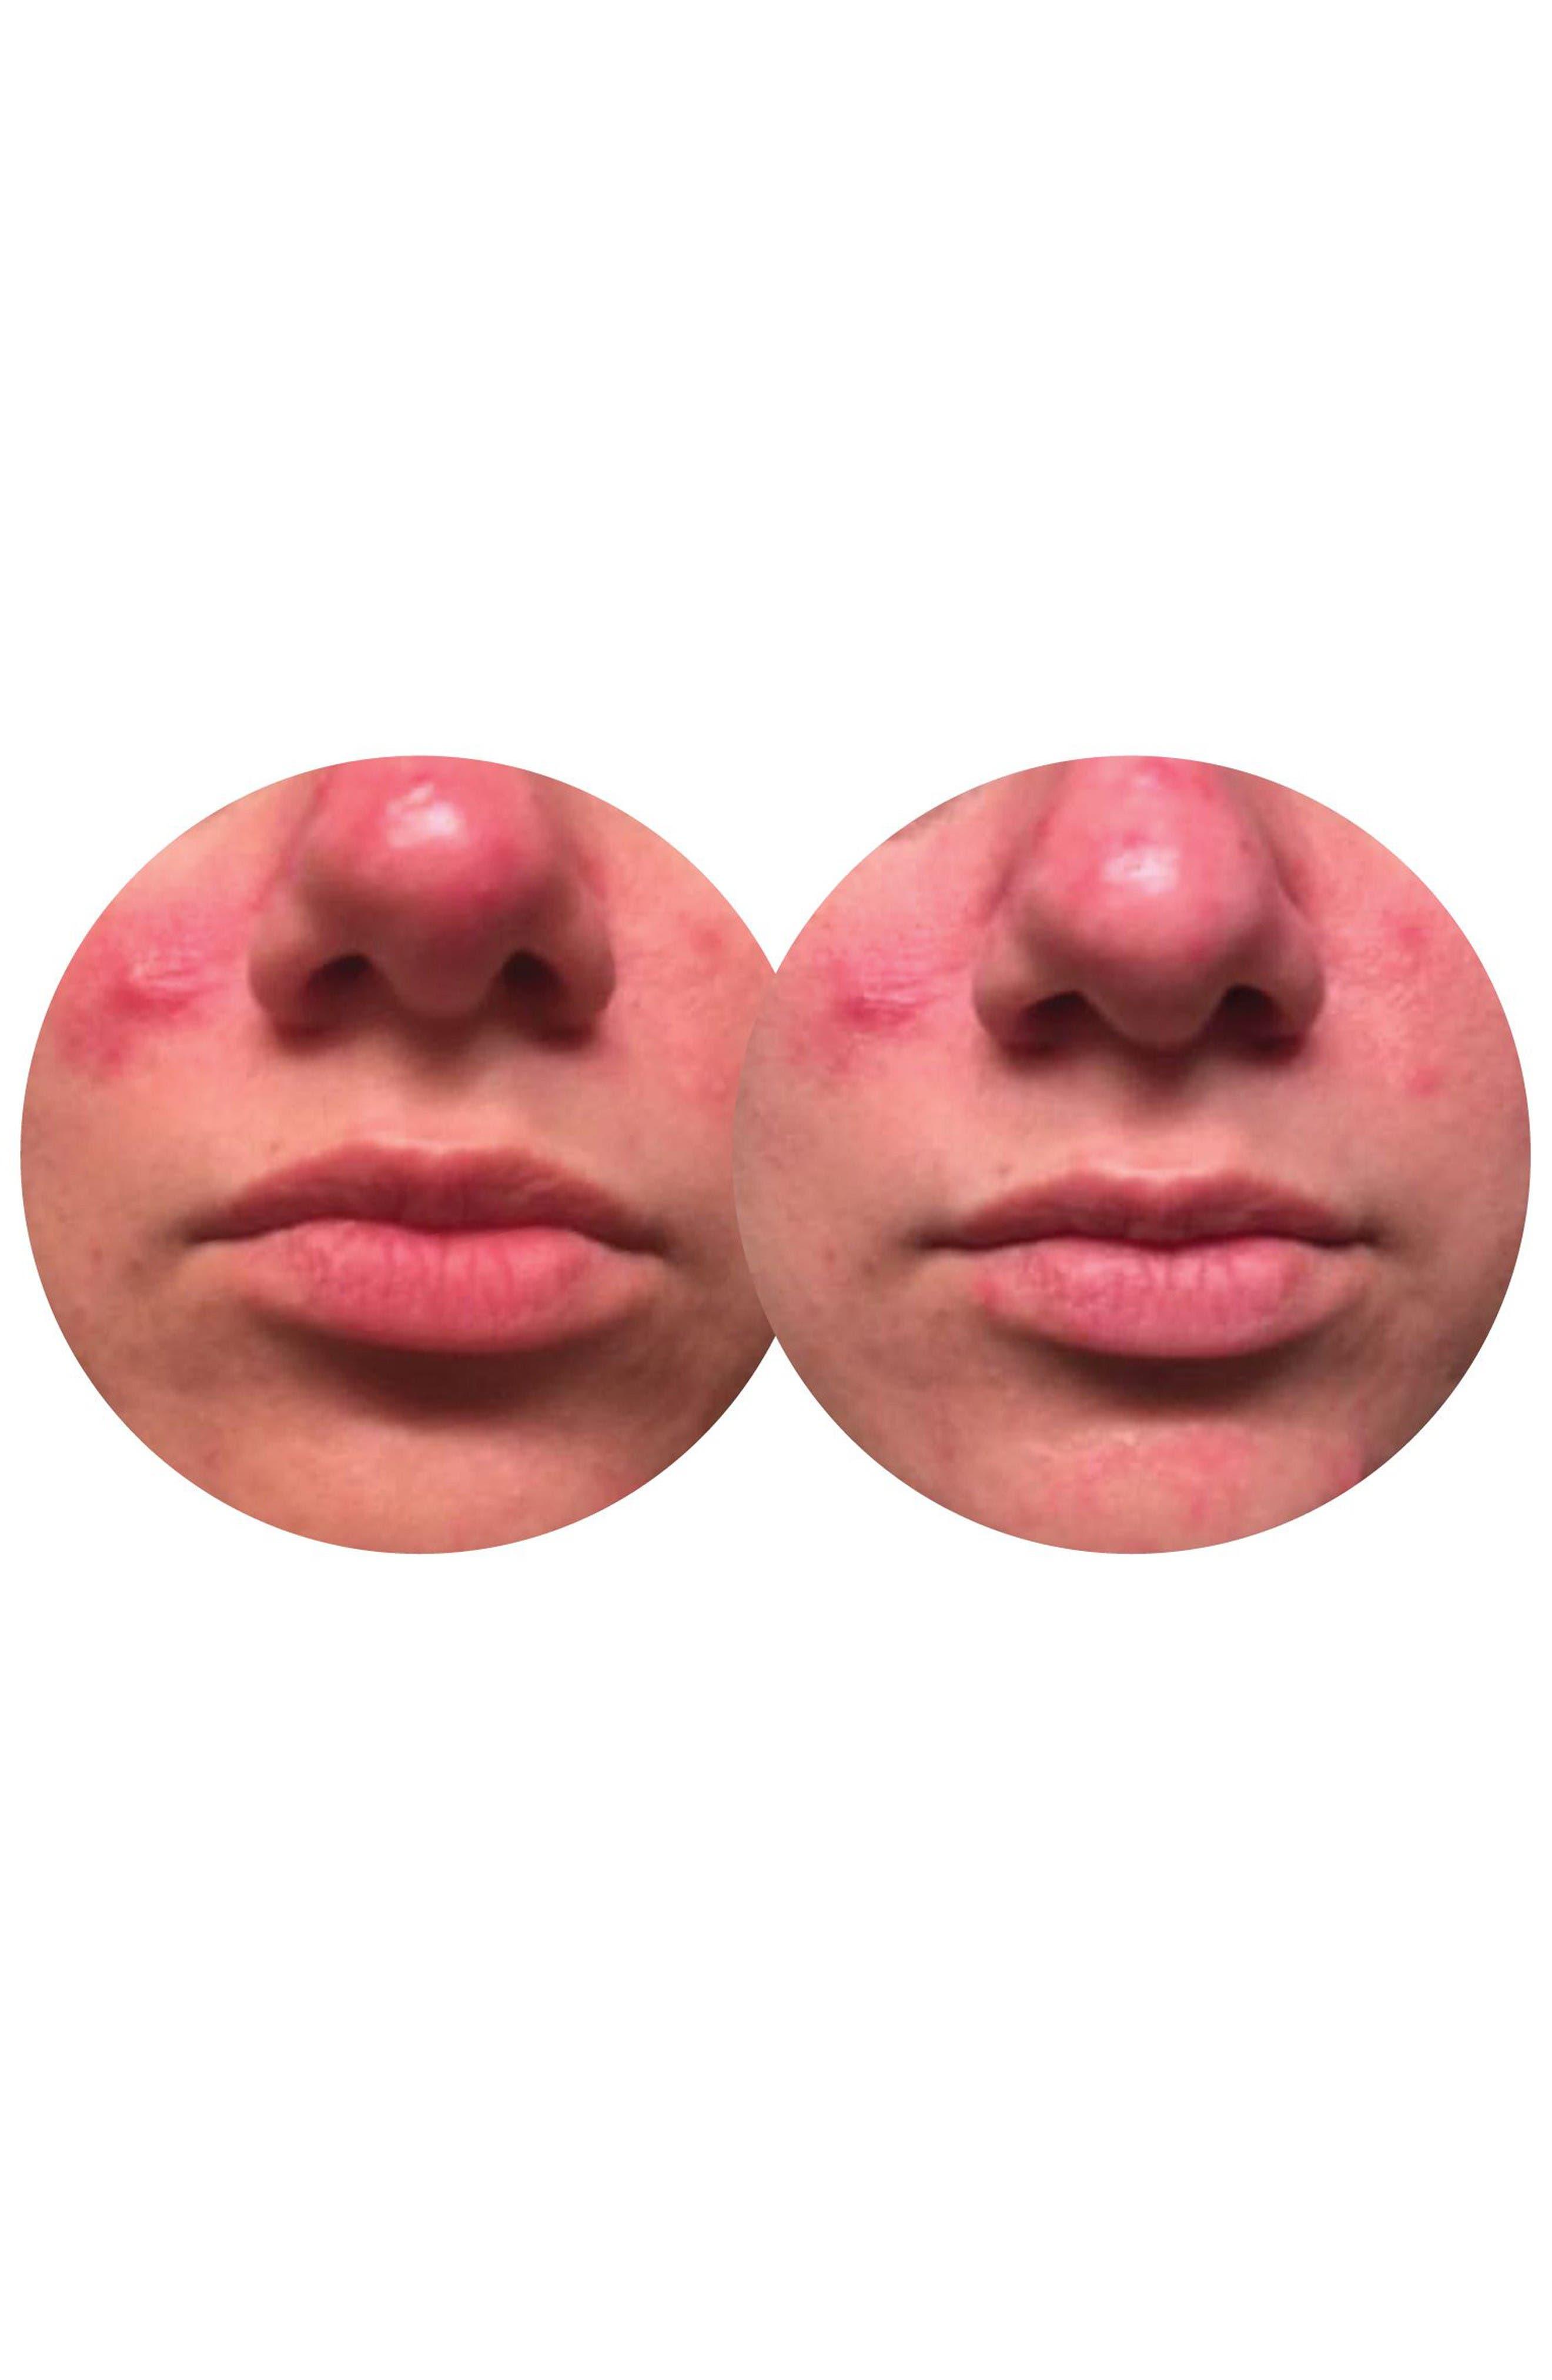 Alternate Image 4  - Dermovia Lace Your Face Healing Yogurt Compression Facial Mask